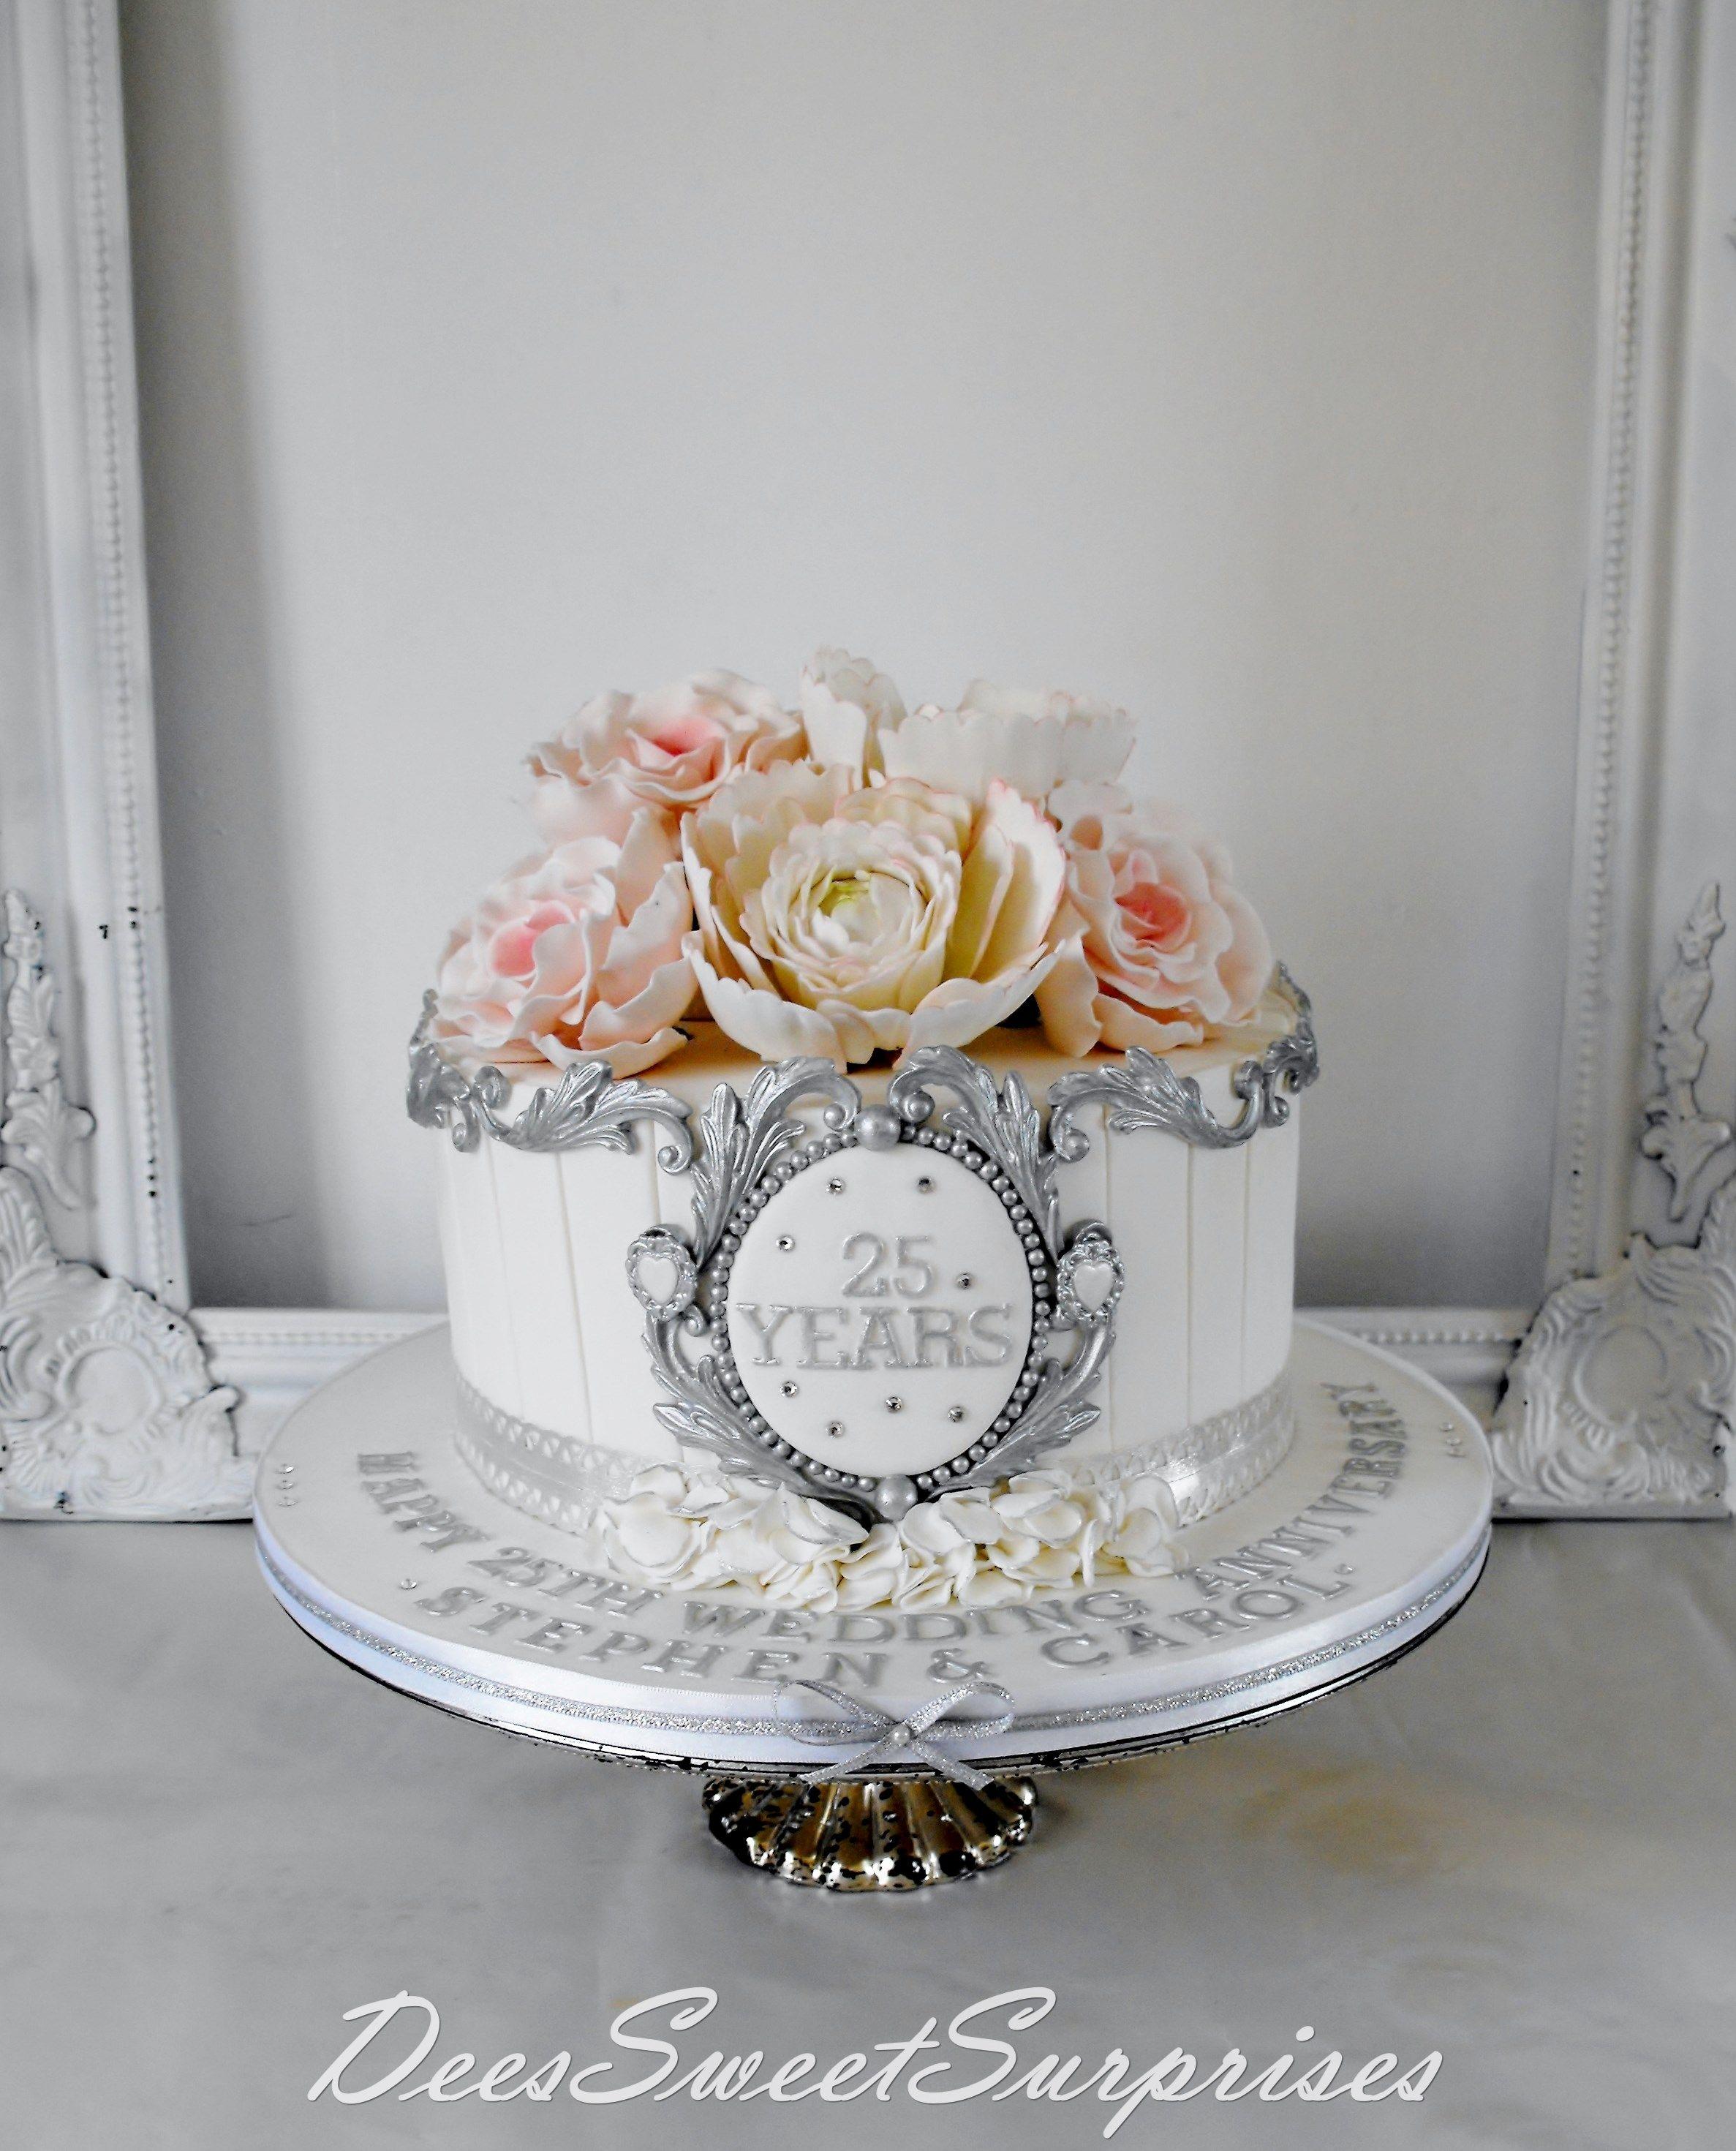 Silver wedding anniversary cake Wedding anniversary